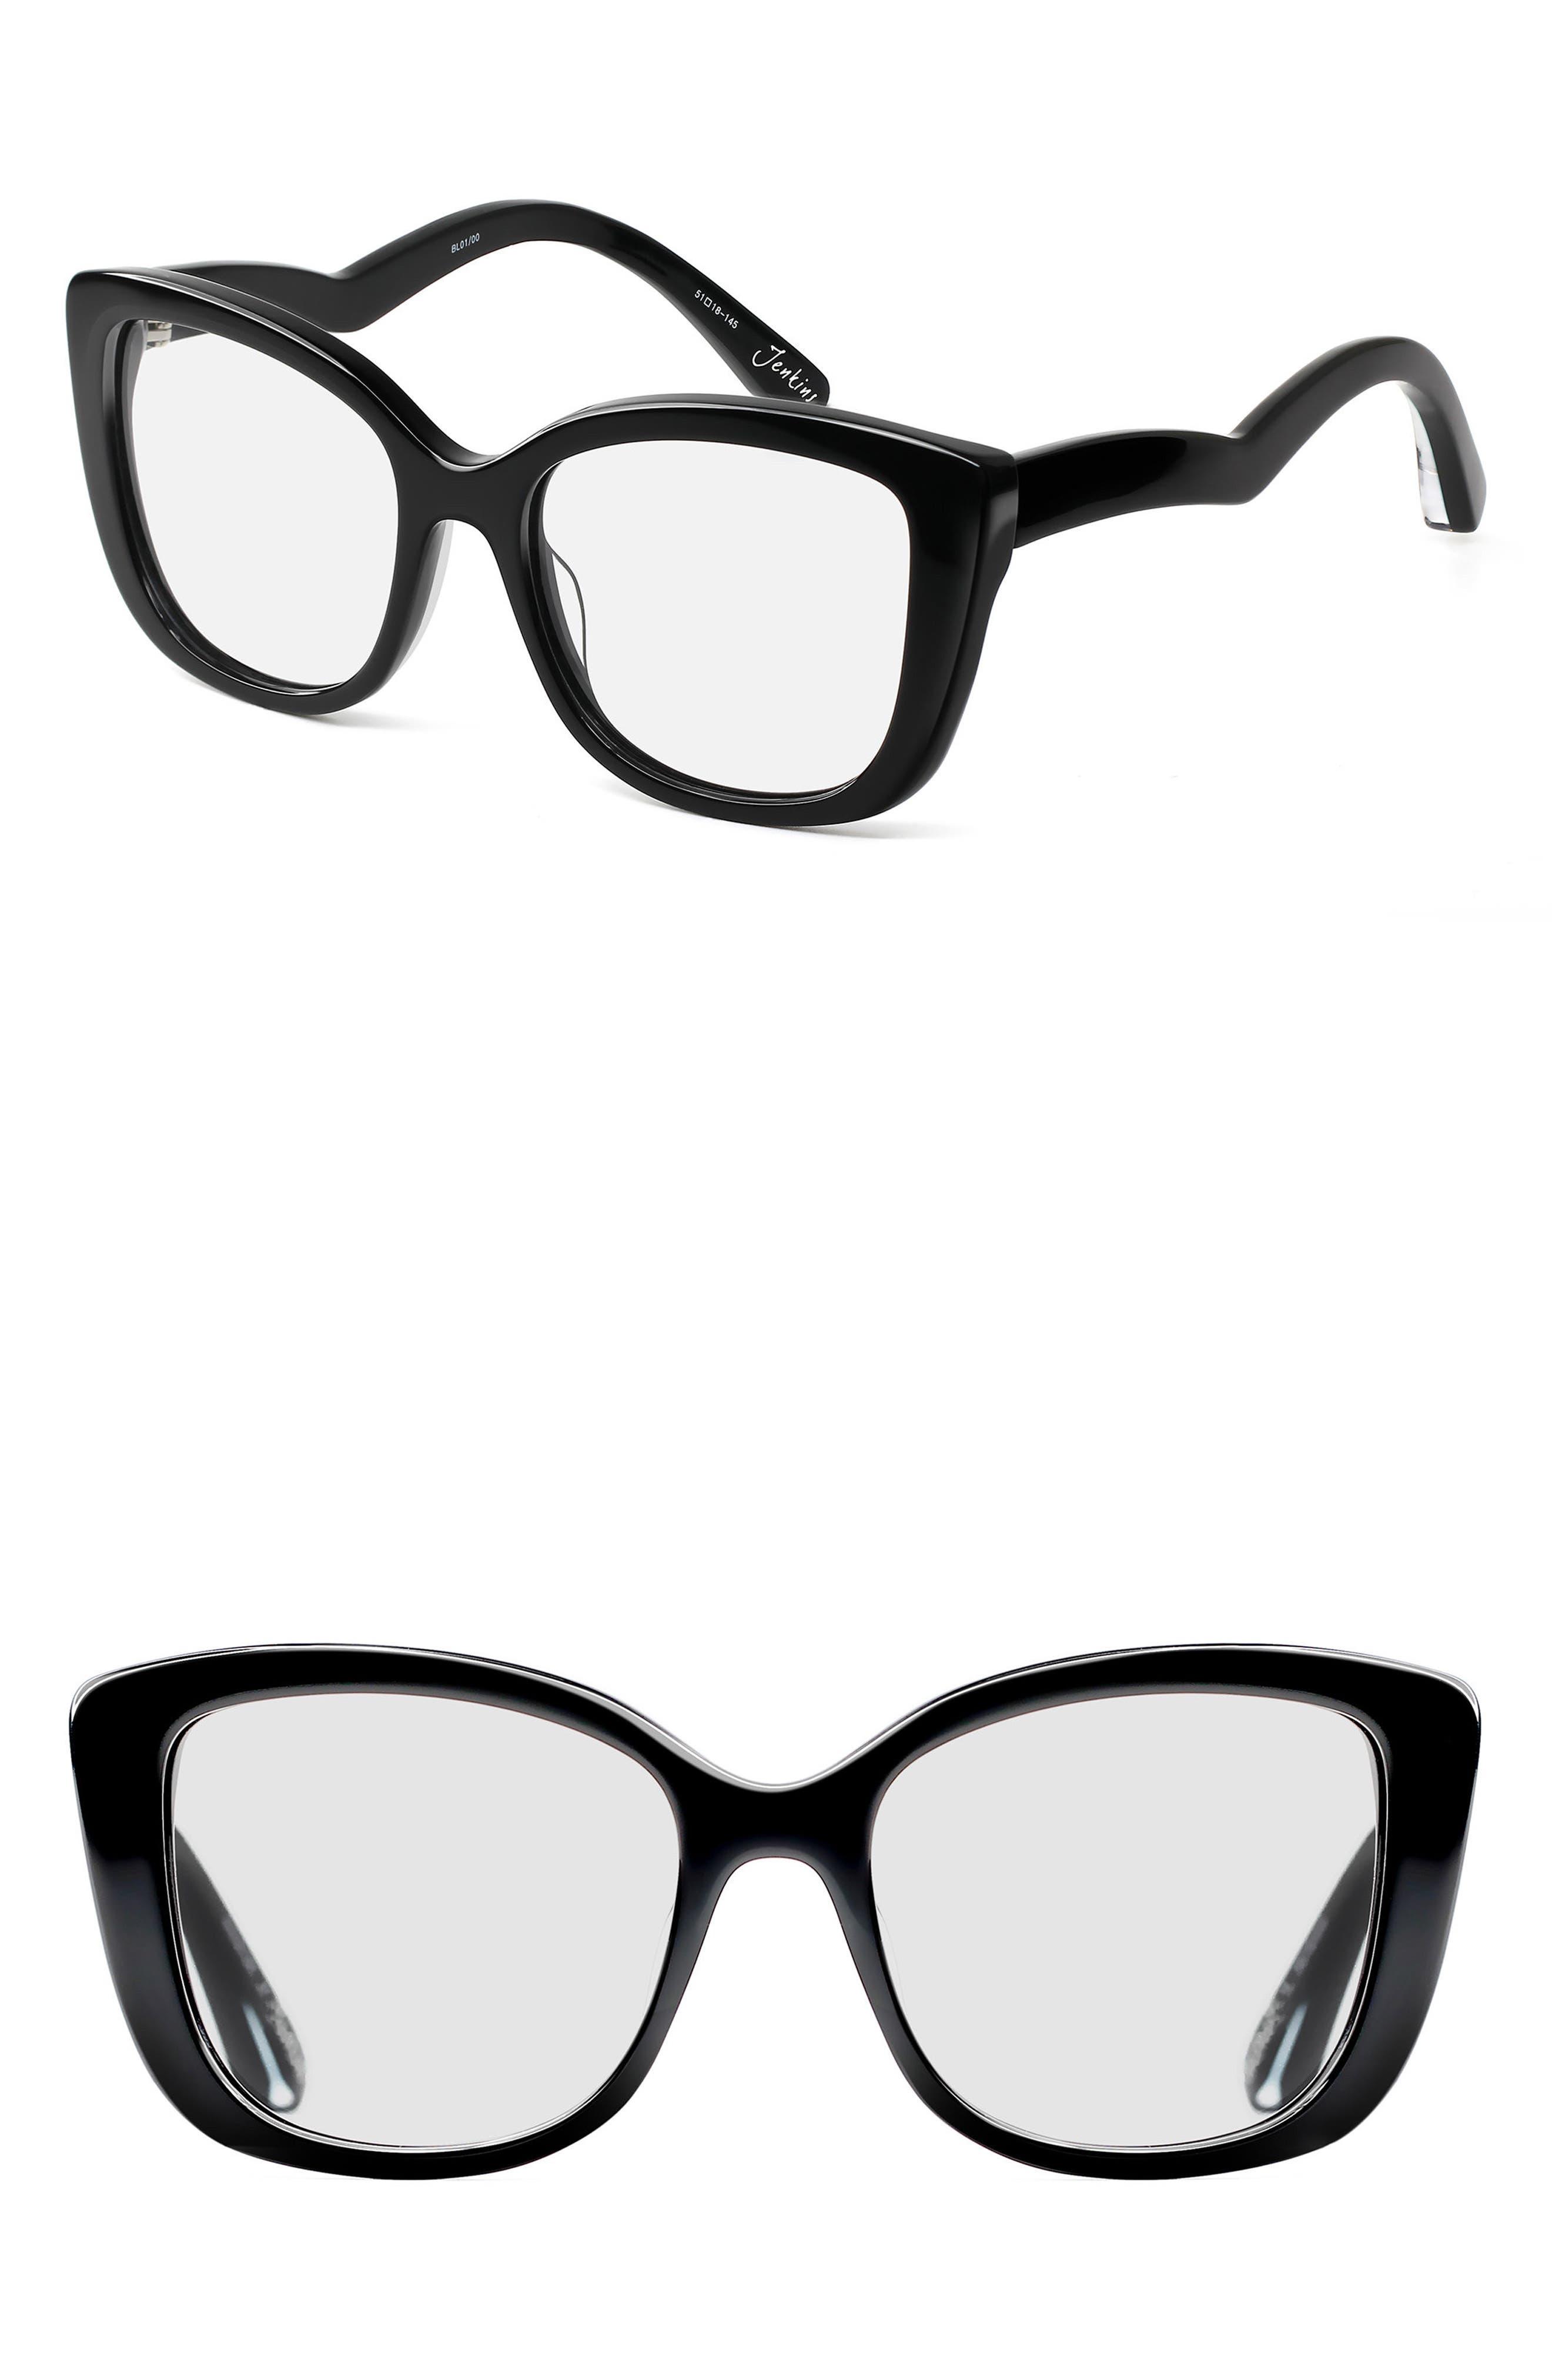 Jenkins 51mm Optical Frames,                             Main thumbnail 1, color,                             Black